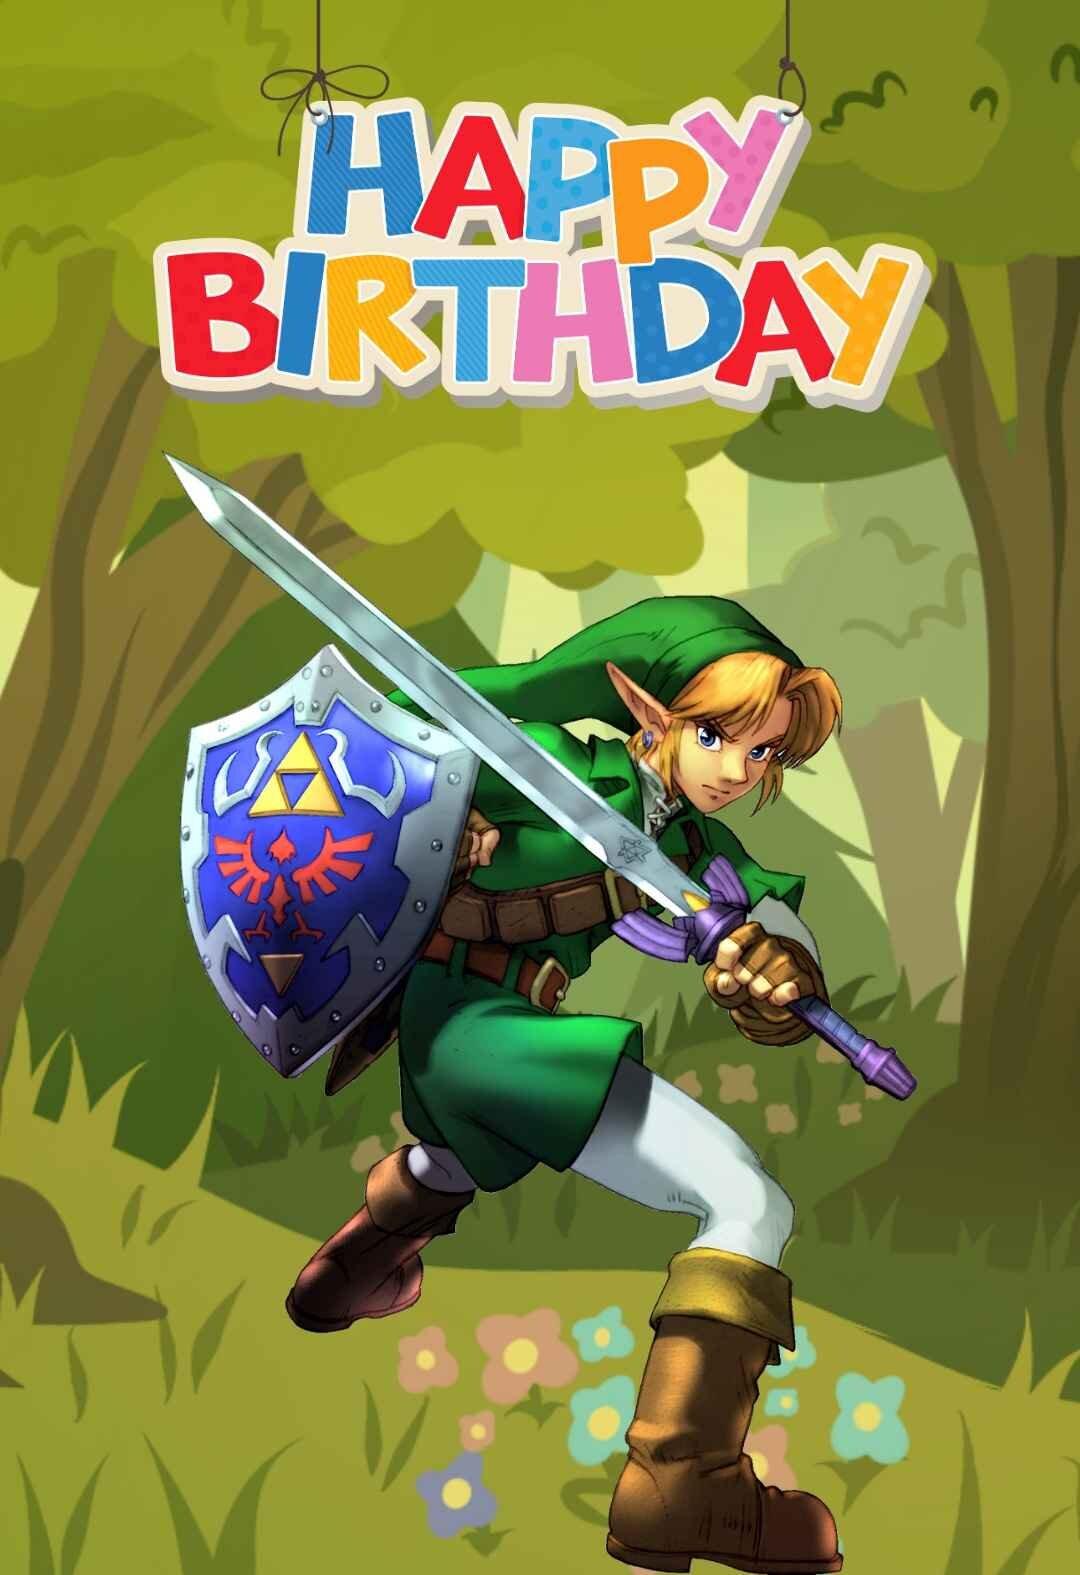 Zelda Printable Birthday Cards — PRINTBIRTHDAY.CARDS